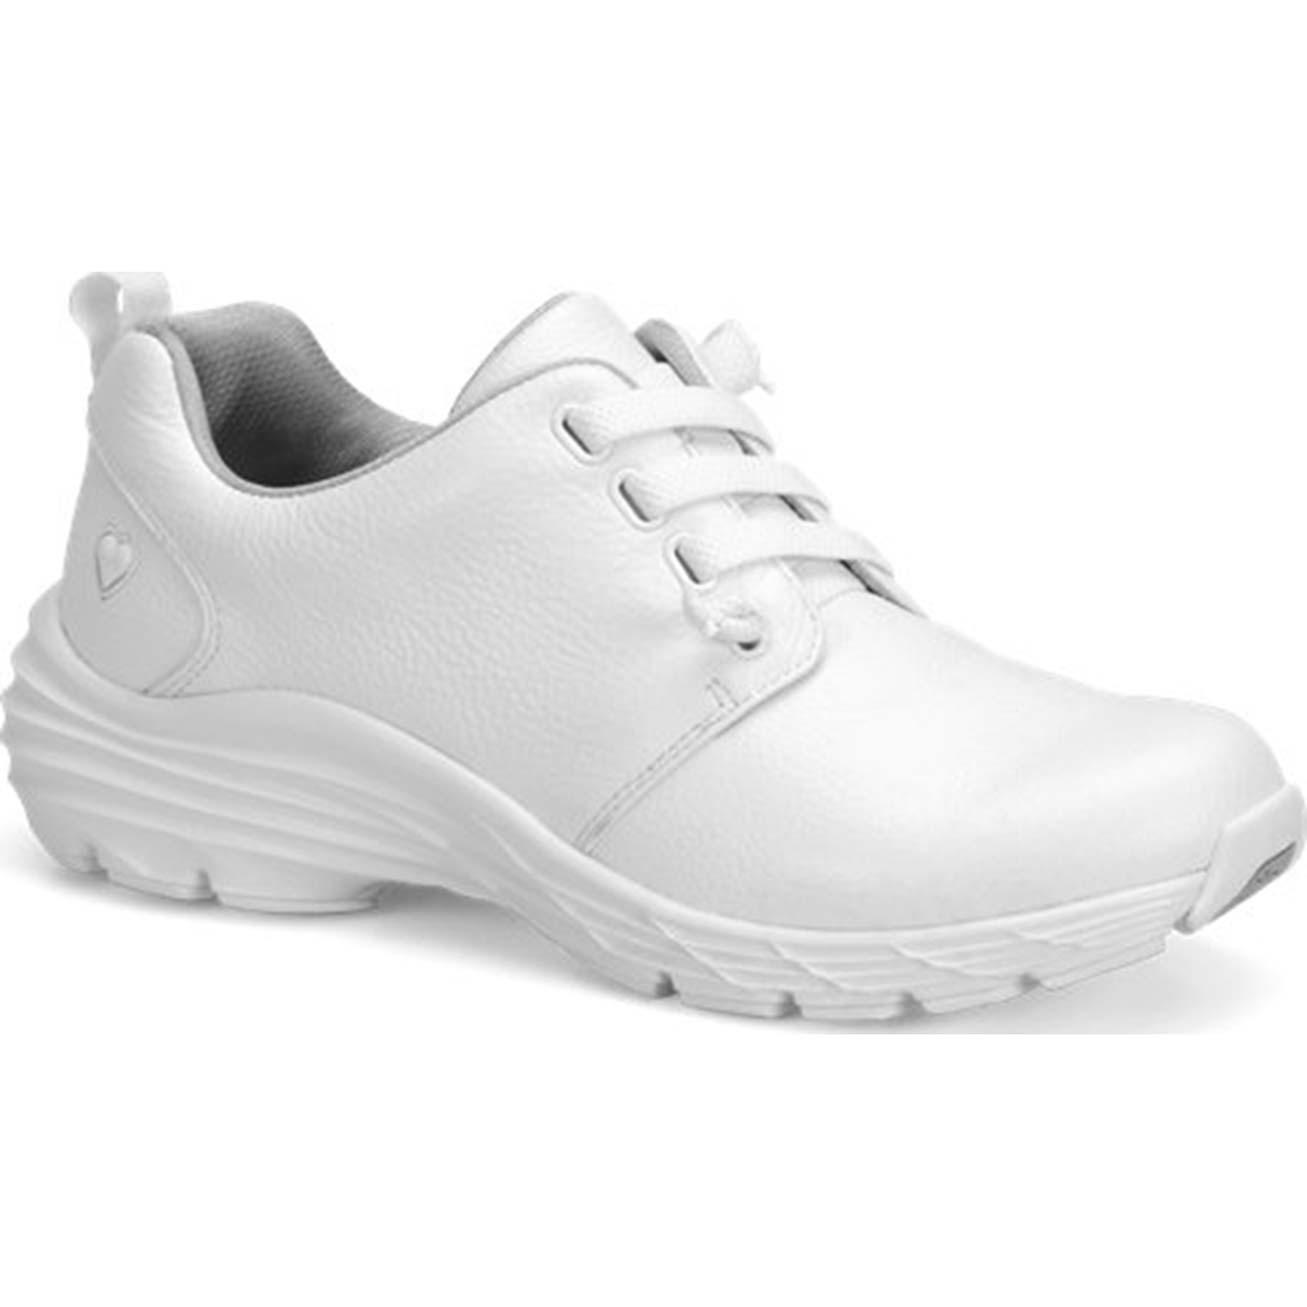 Nurse Mates Align Velocity Women s Slip-Resistant ShoeNurse Mates Align  Velocity Women s Slip-Resistant Shoe 3989135a5